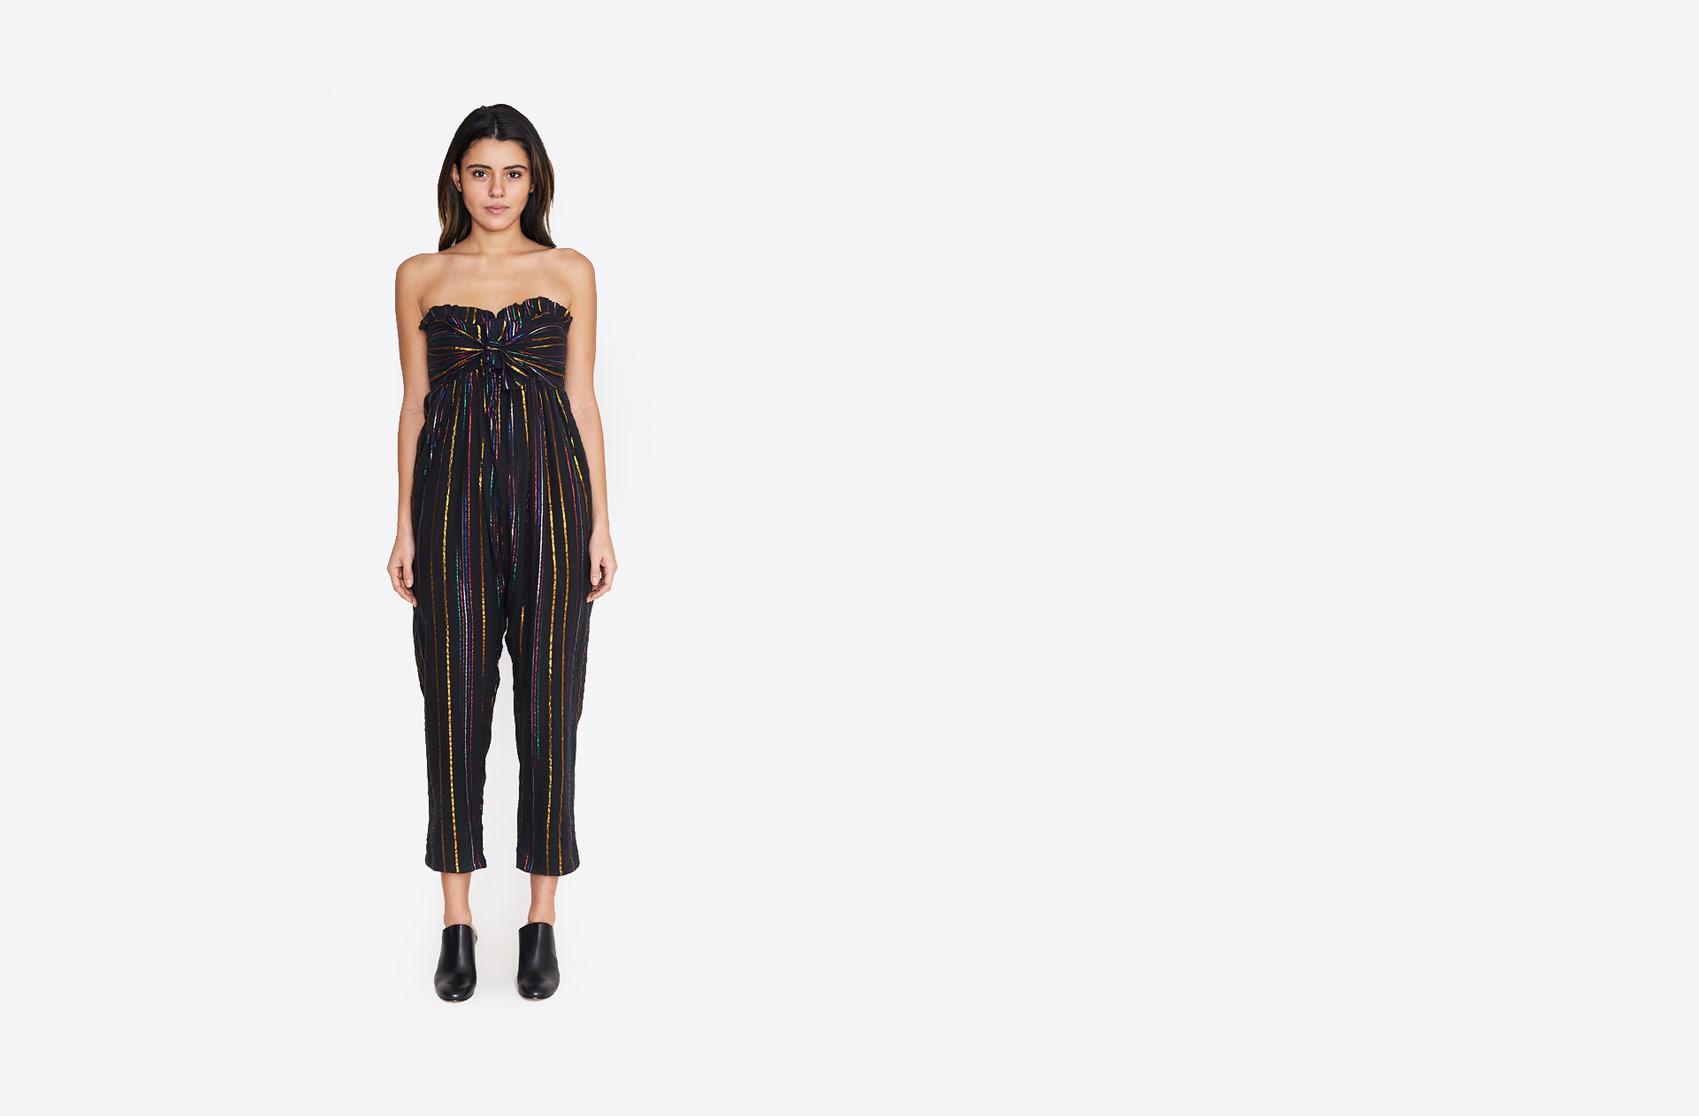 8a1d537b918 Lyst - Apiece Apart Gipsea Jumpsuit in Black